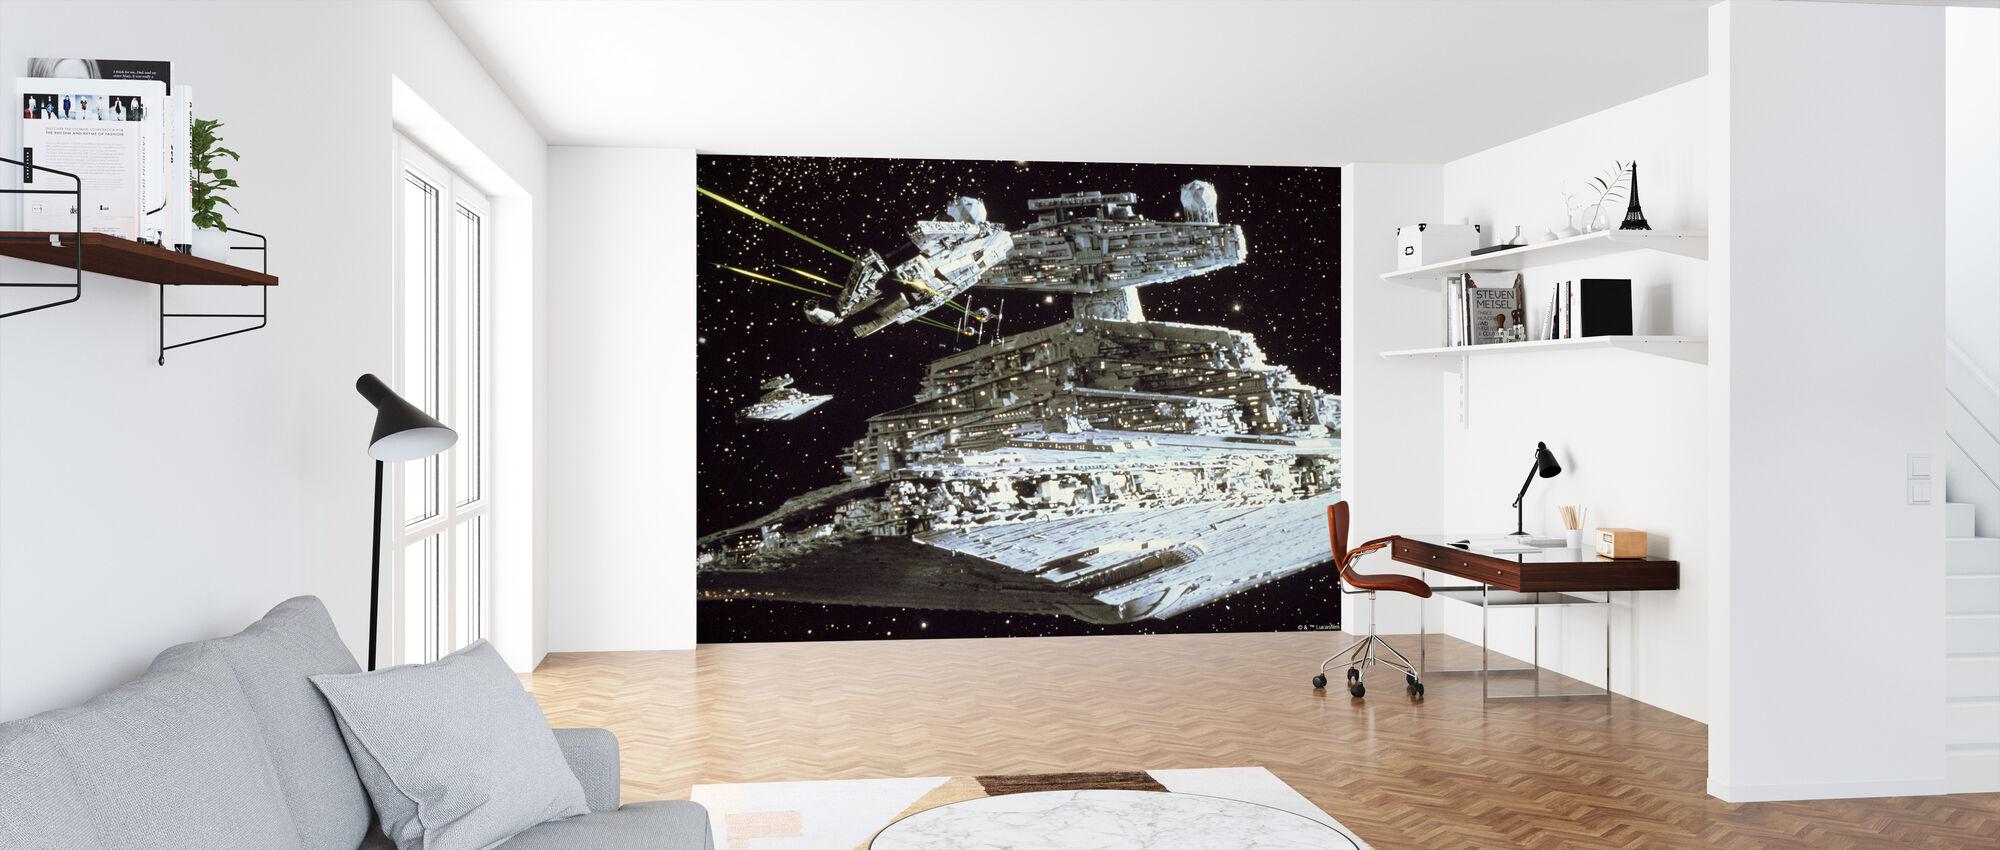 Star Wars - Millennium Falcon angrep - Tapet - Kontor